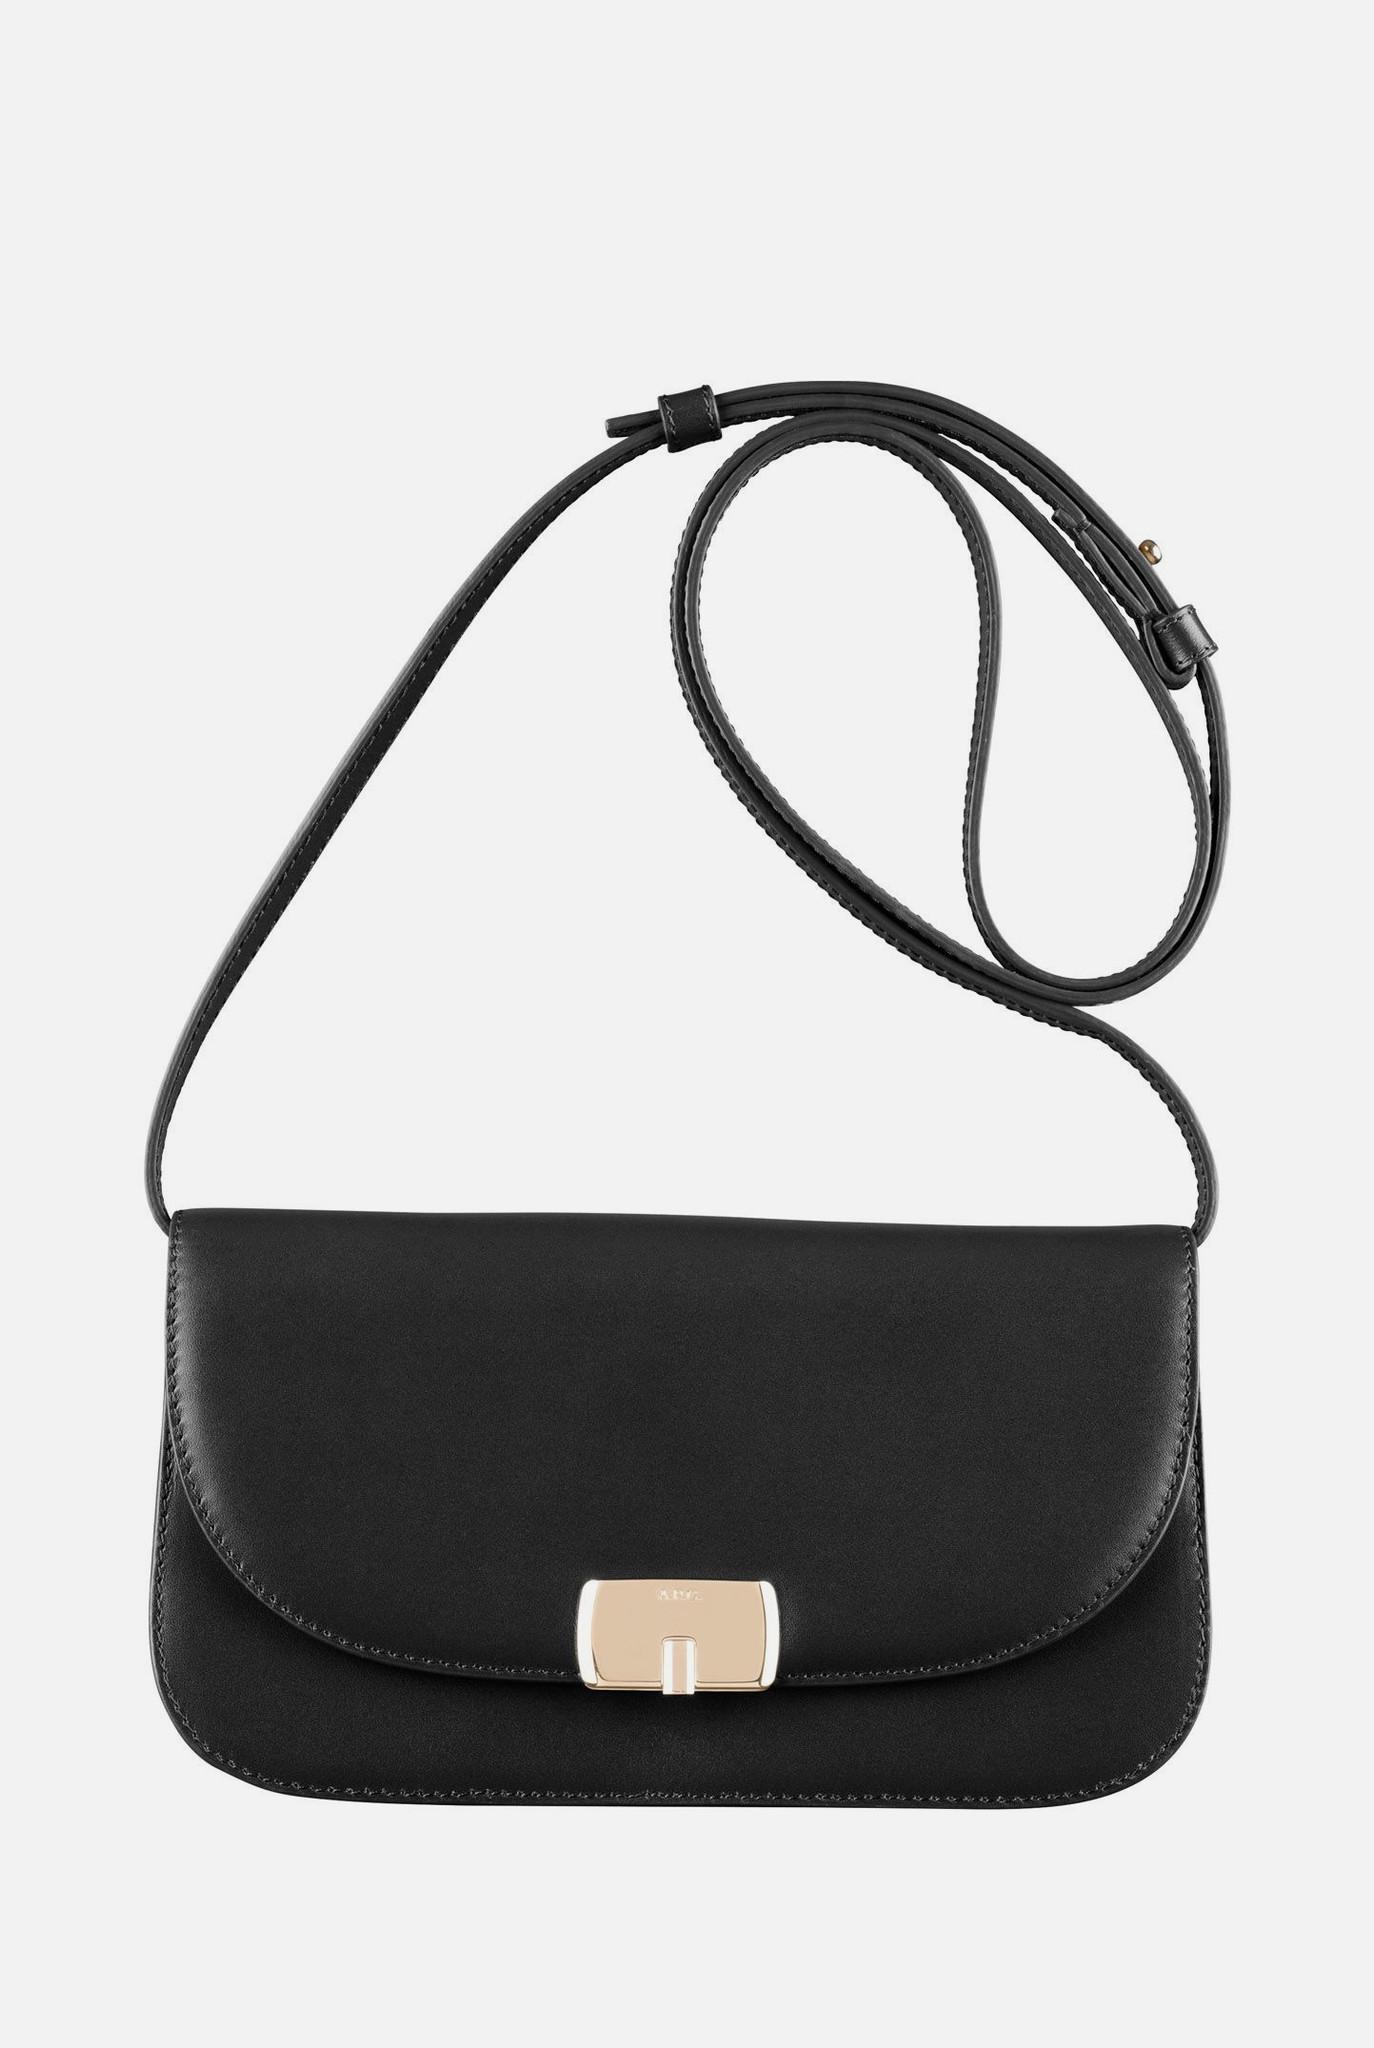 Eva bag black